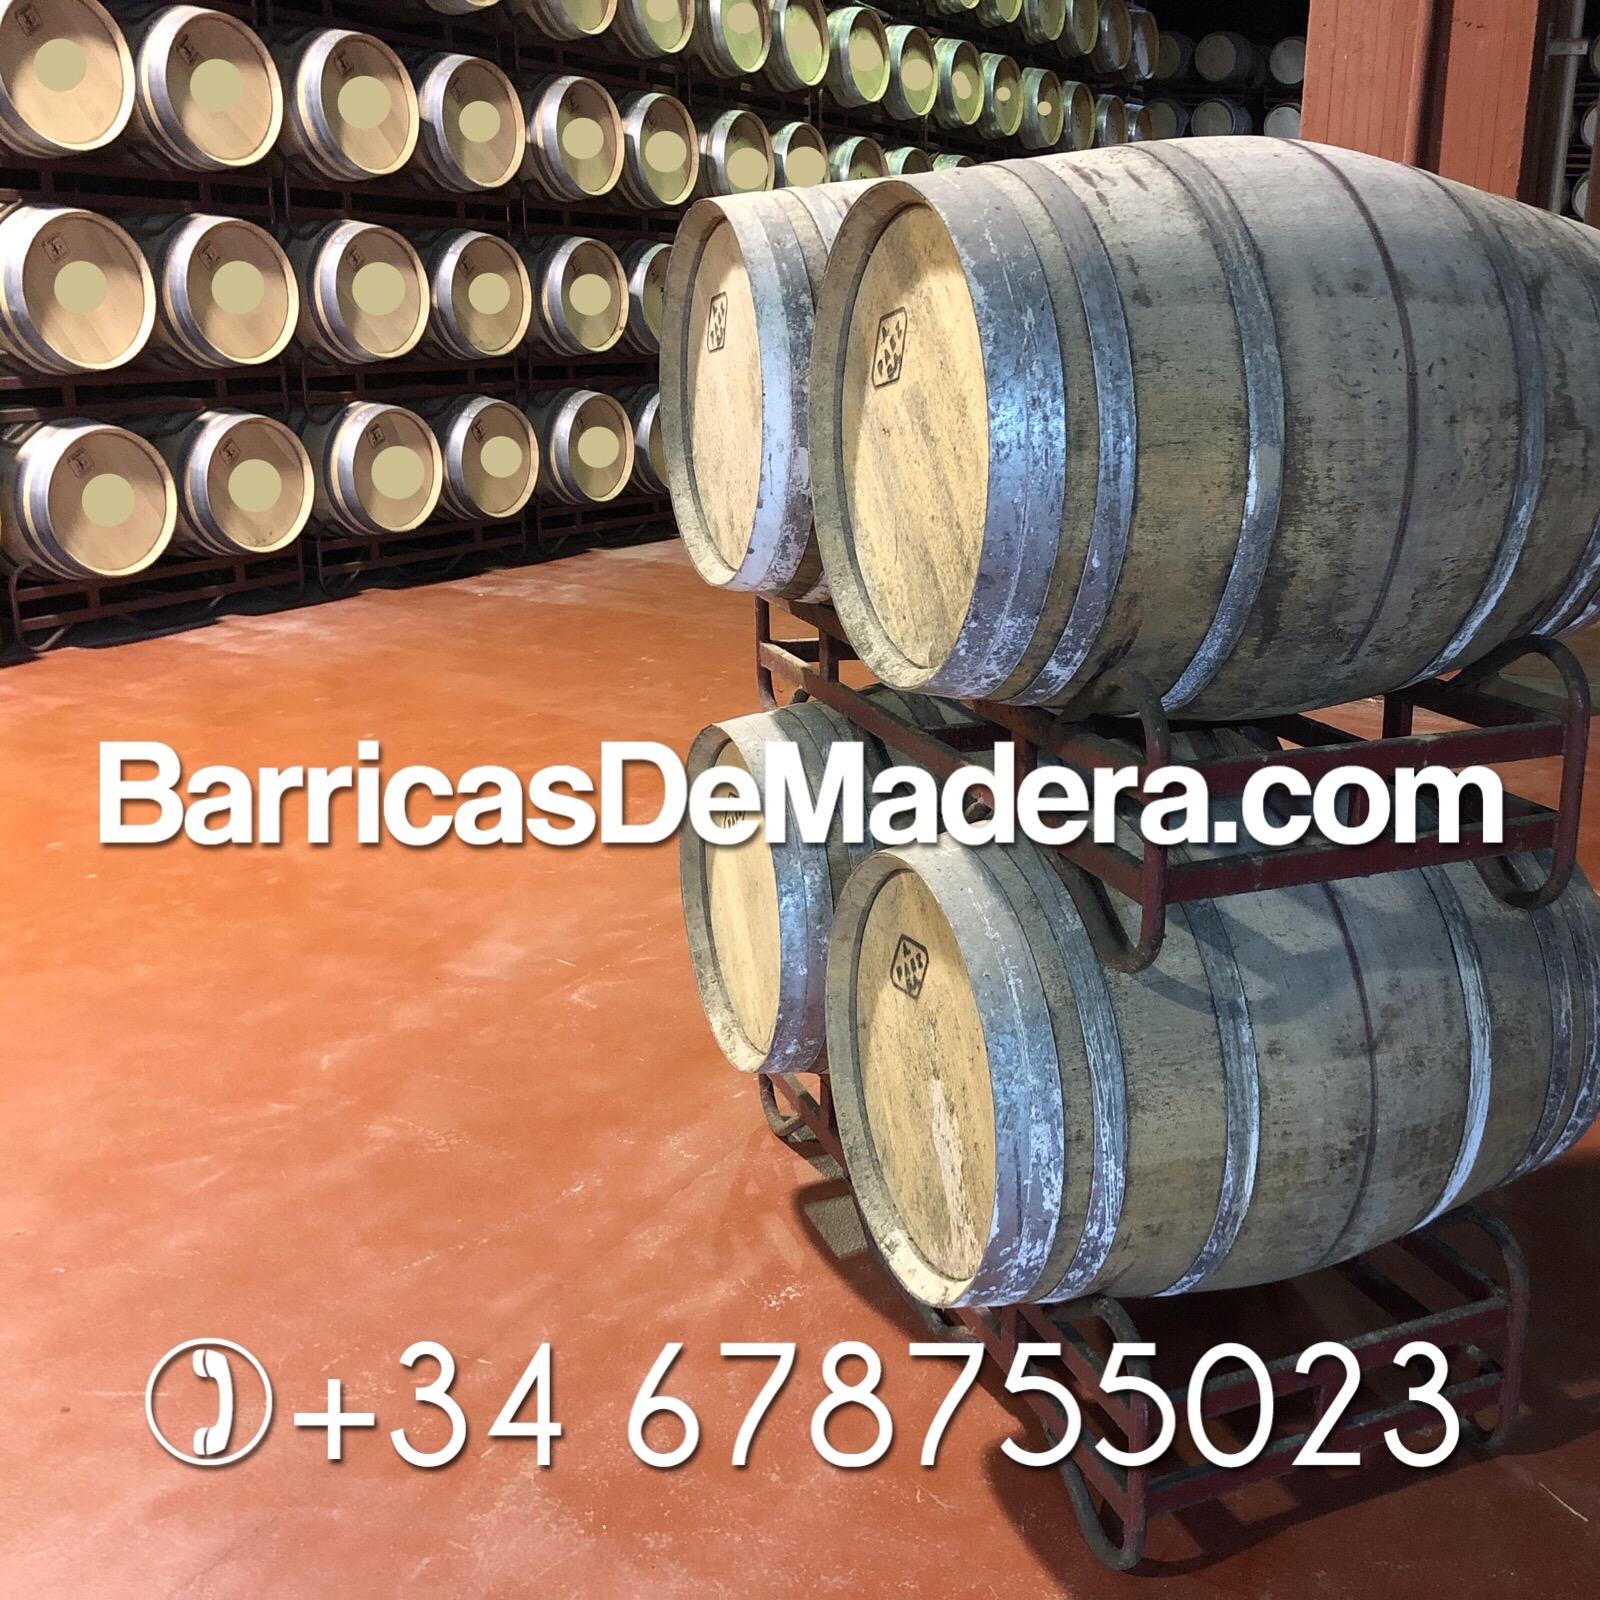 spain-used-wine-barrels-winery-cellar